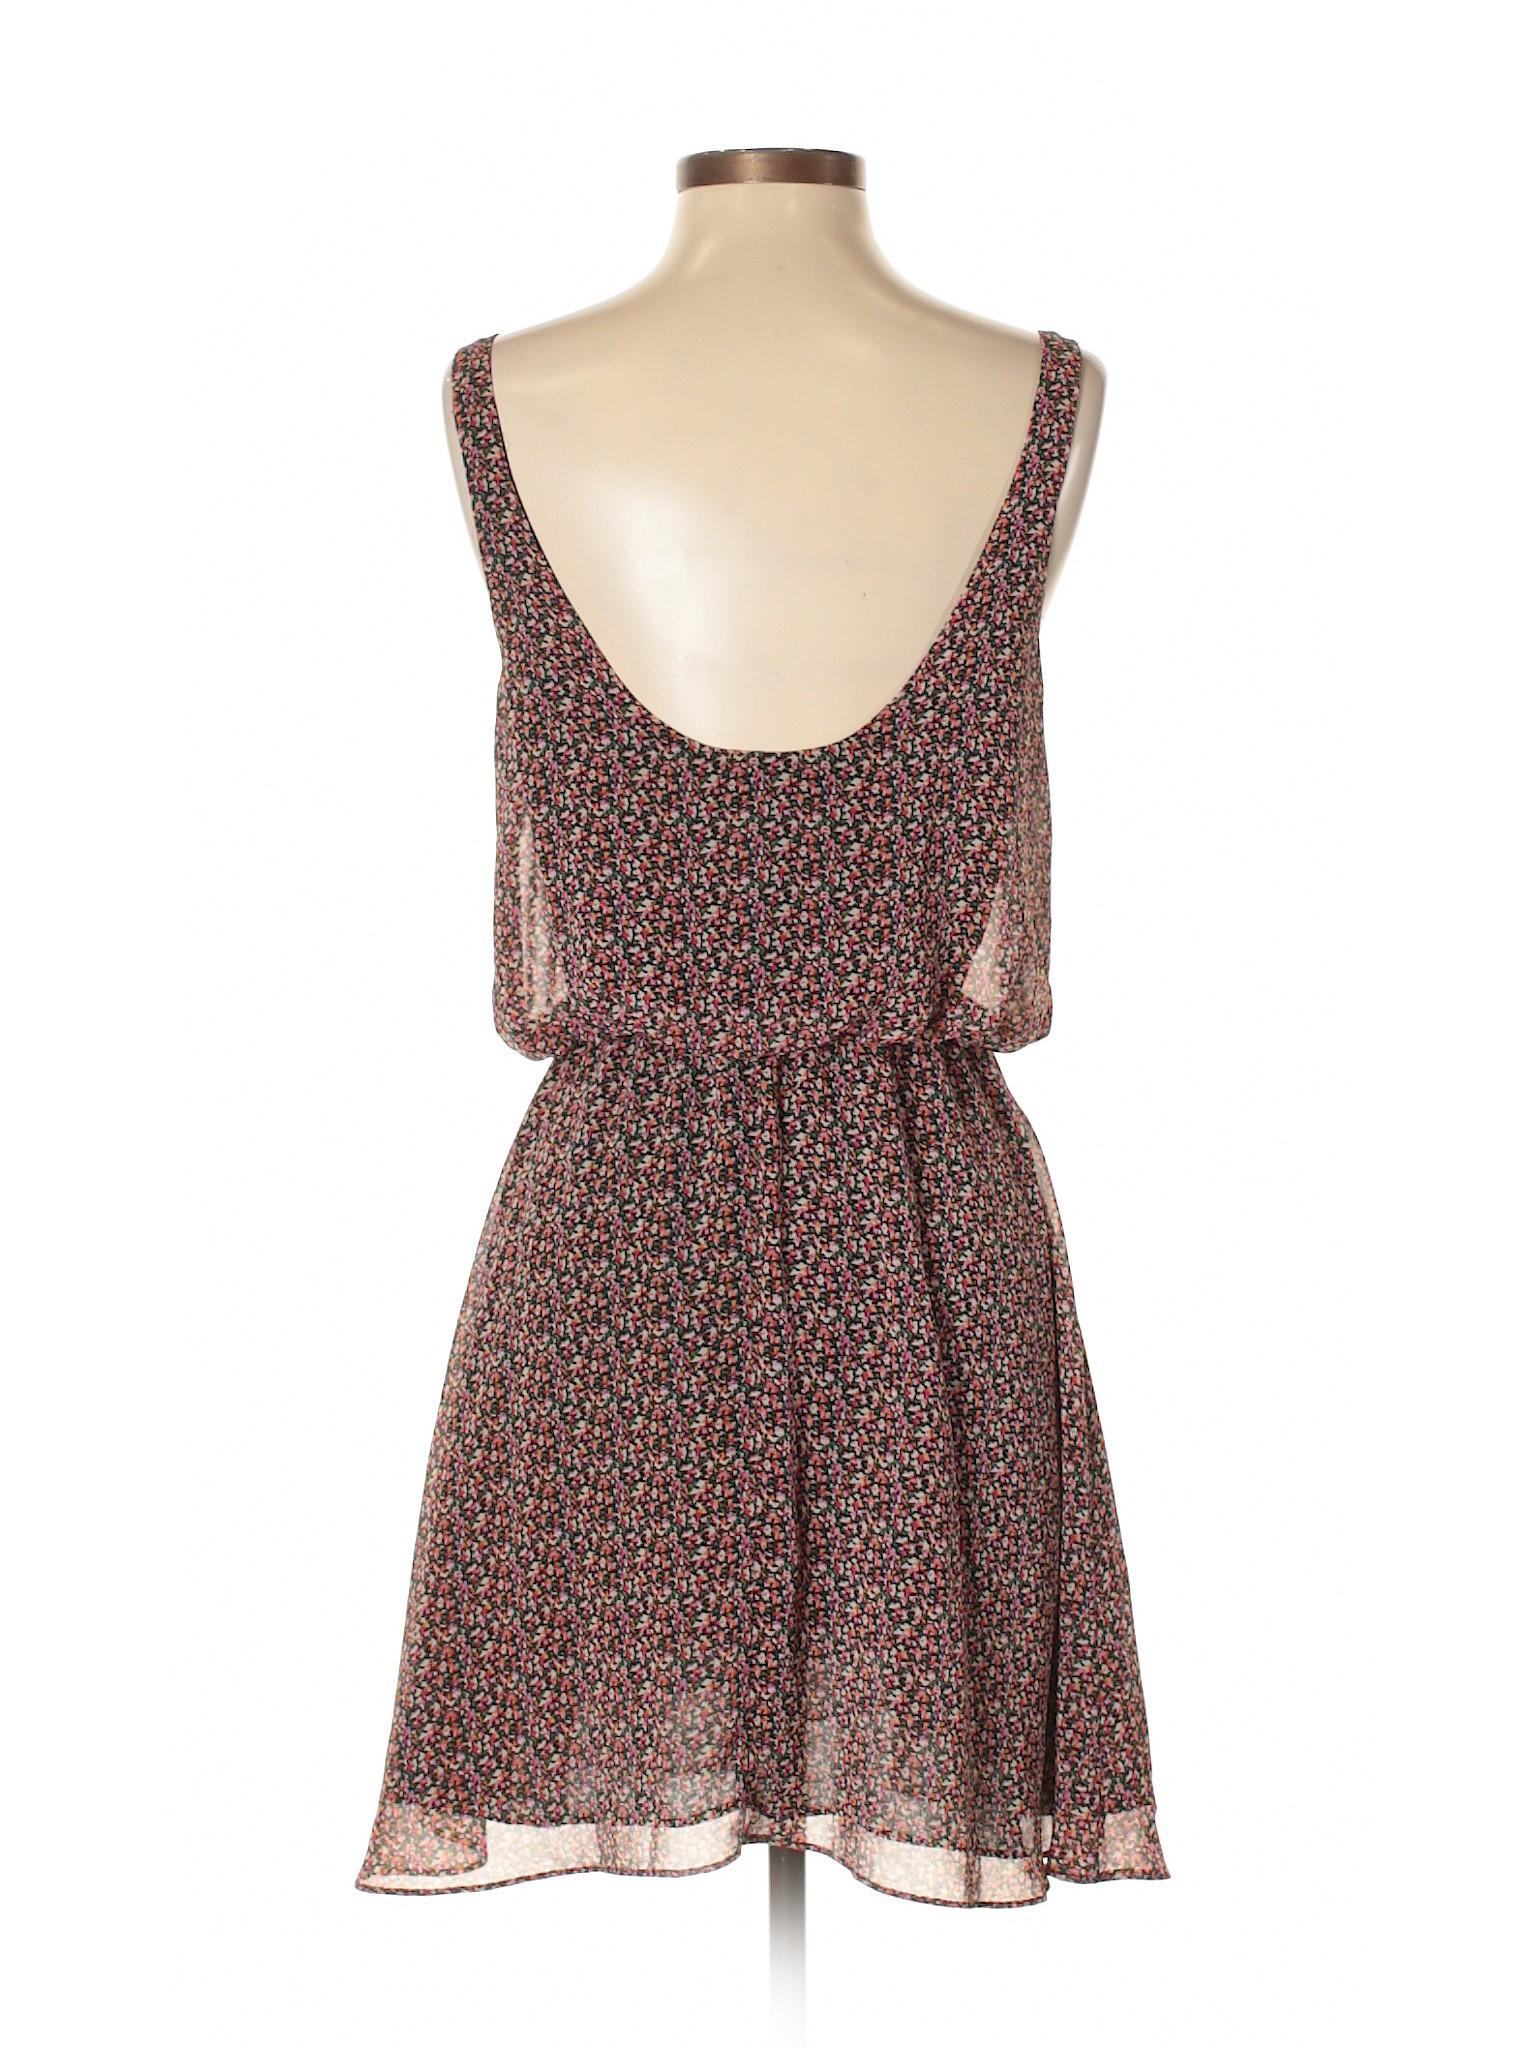 Selling Casual Kincaid Patterson J Dress BxP4ZB